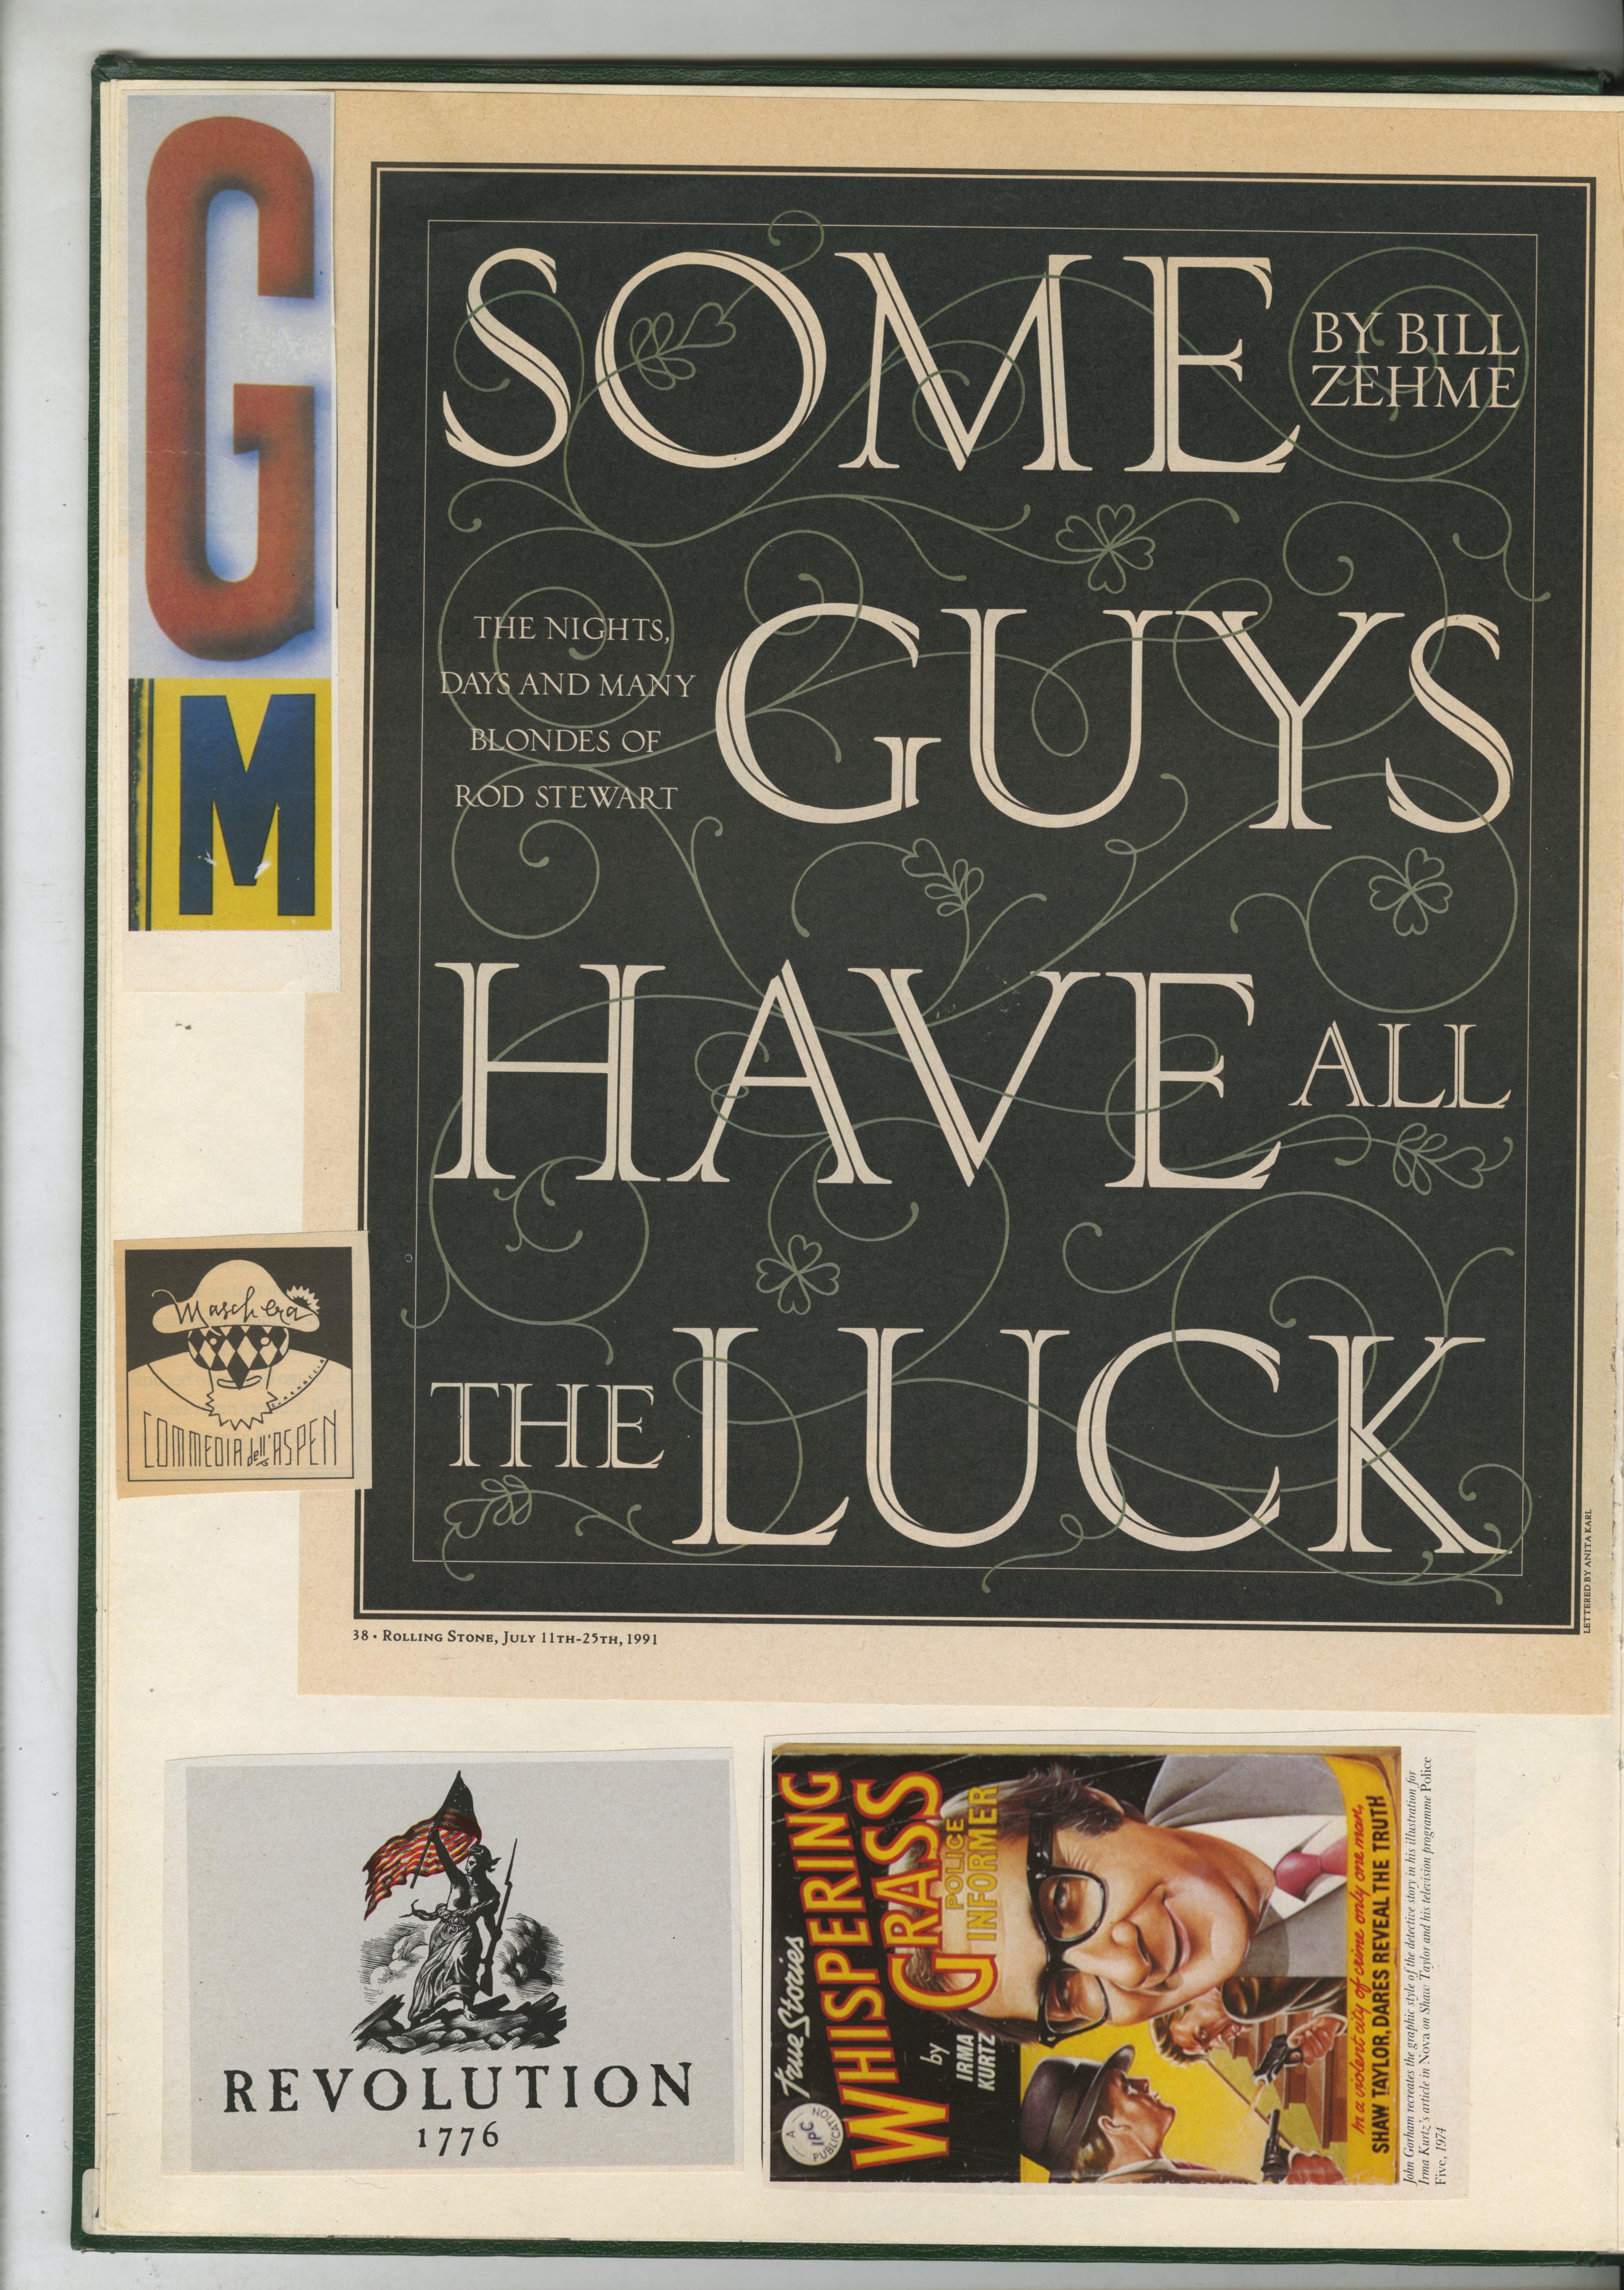 6. GREEN BOOKS: 'Type'